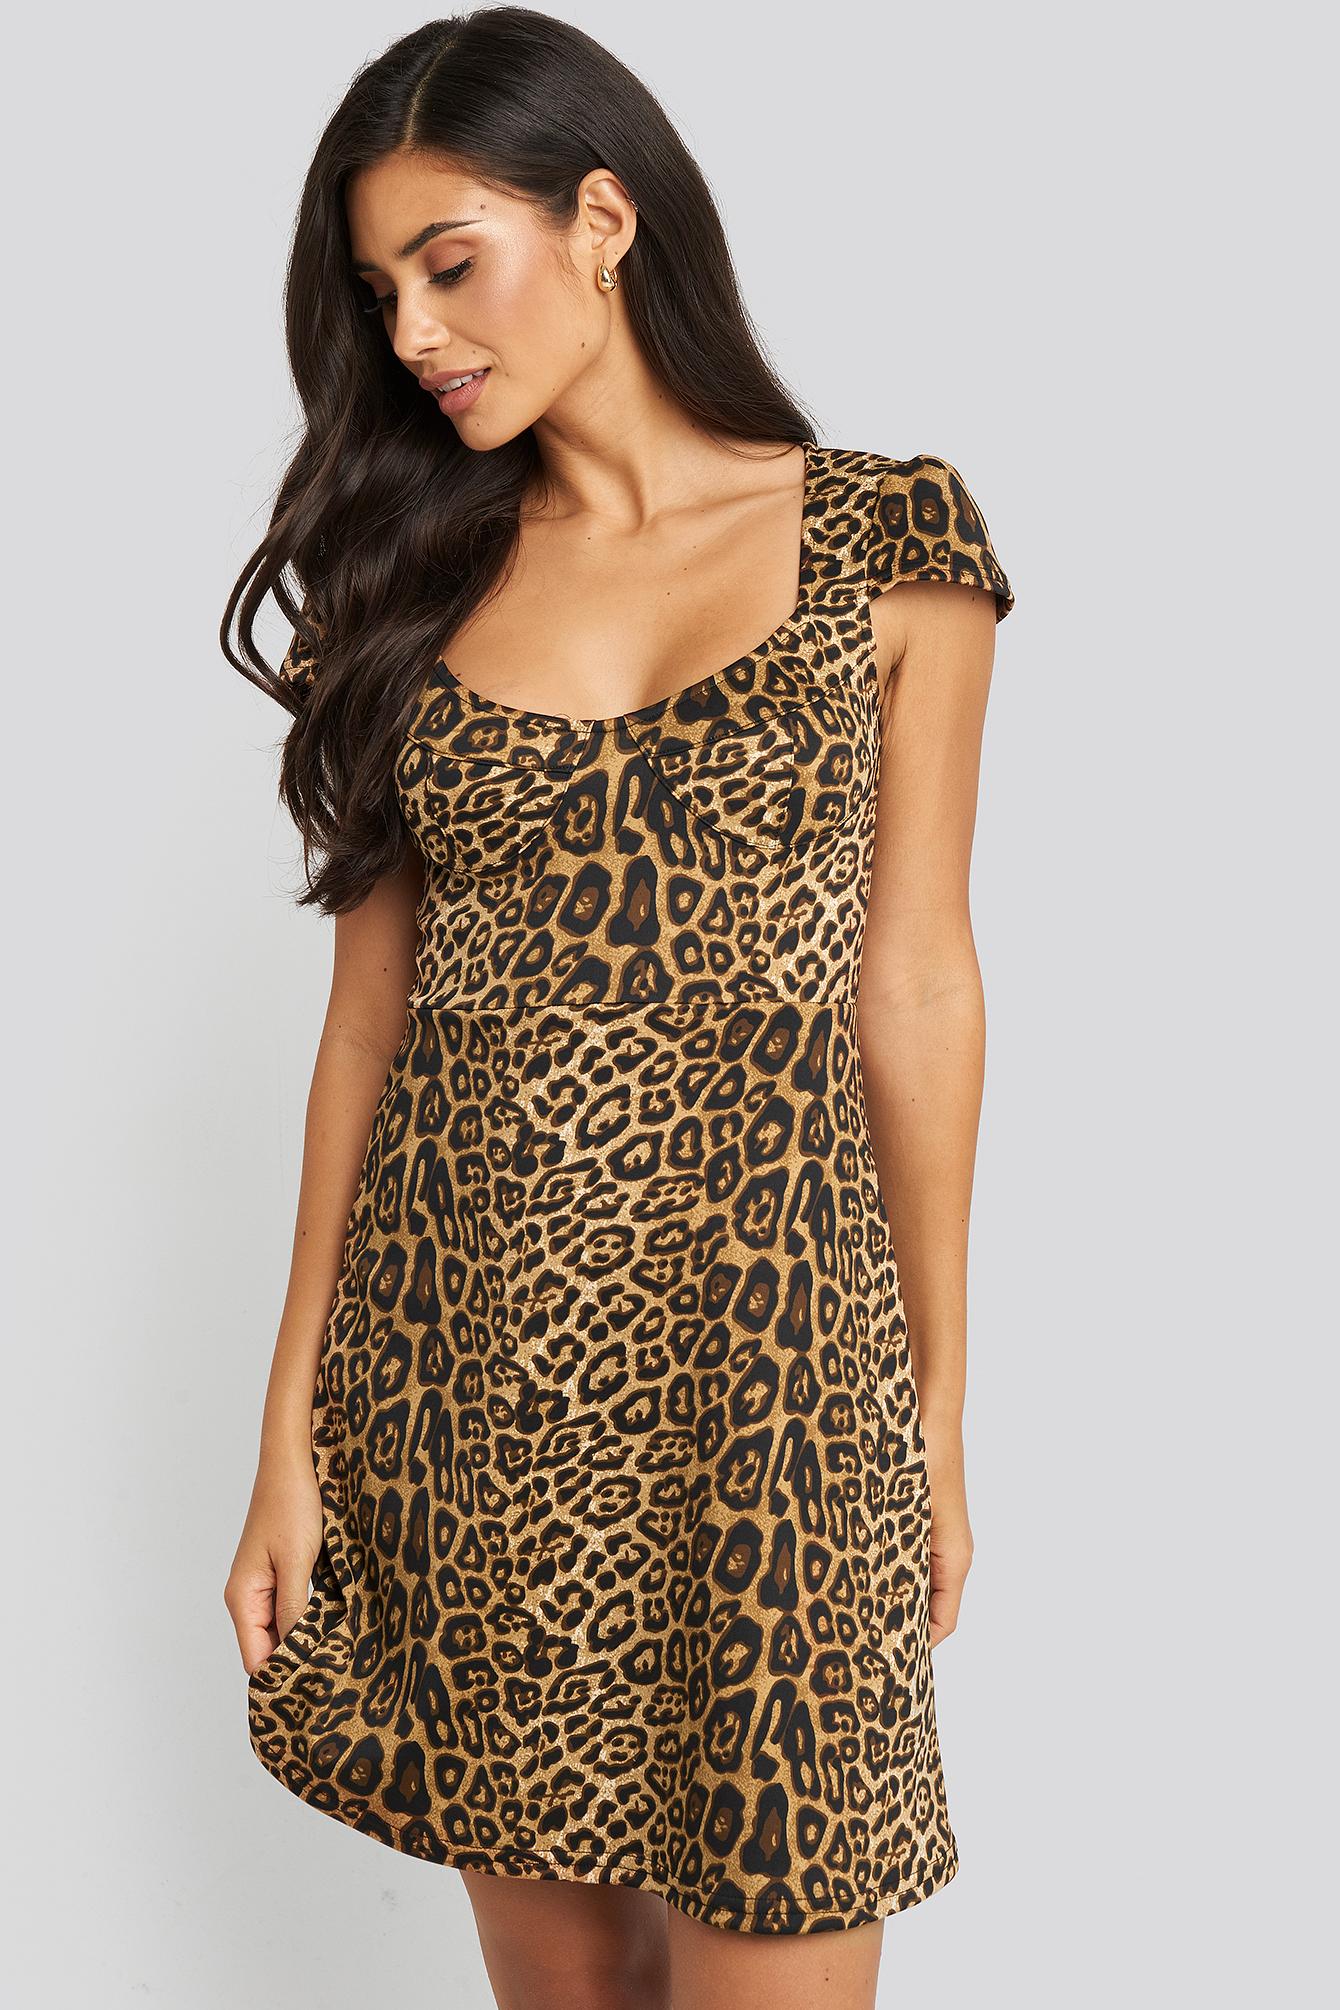 na-kd trend -  Short Sleeve Printed Mini Dress - Brown,Multicolor